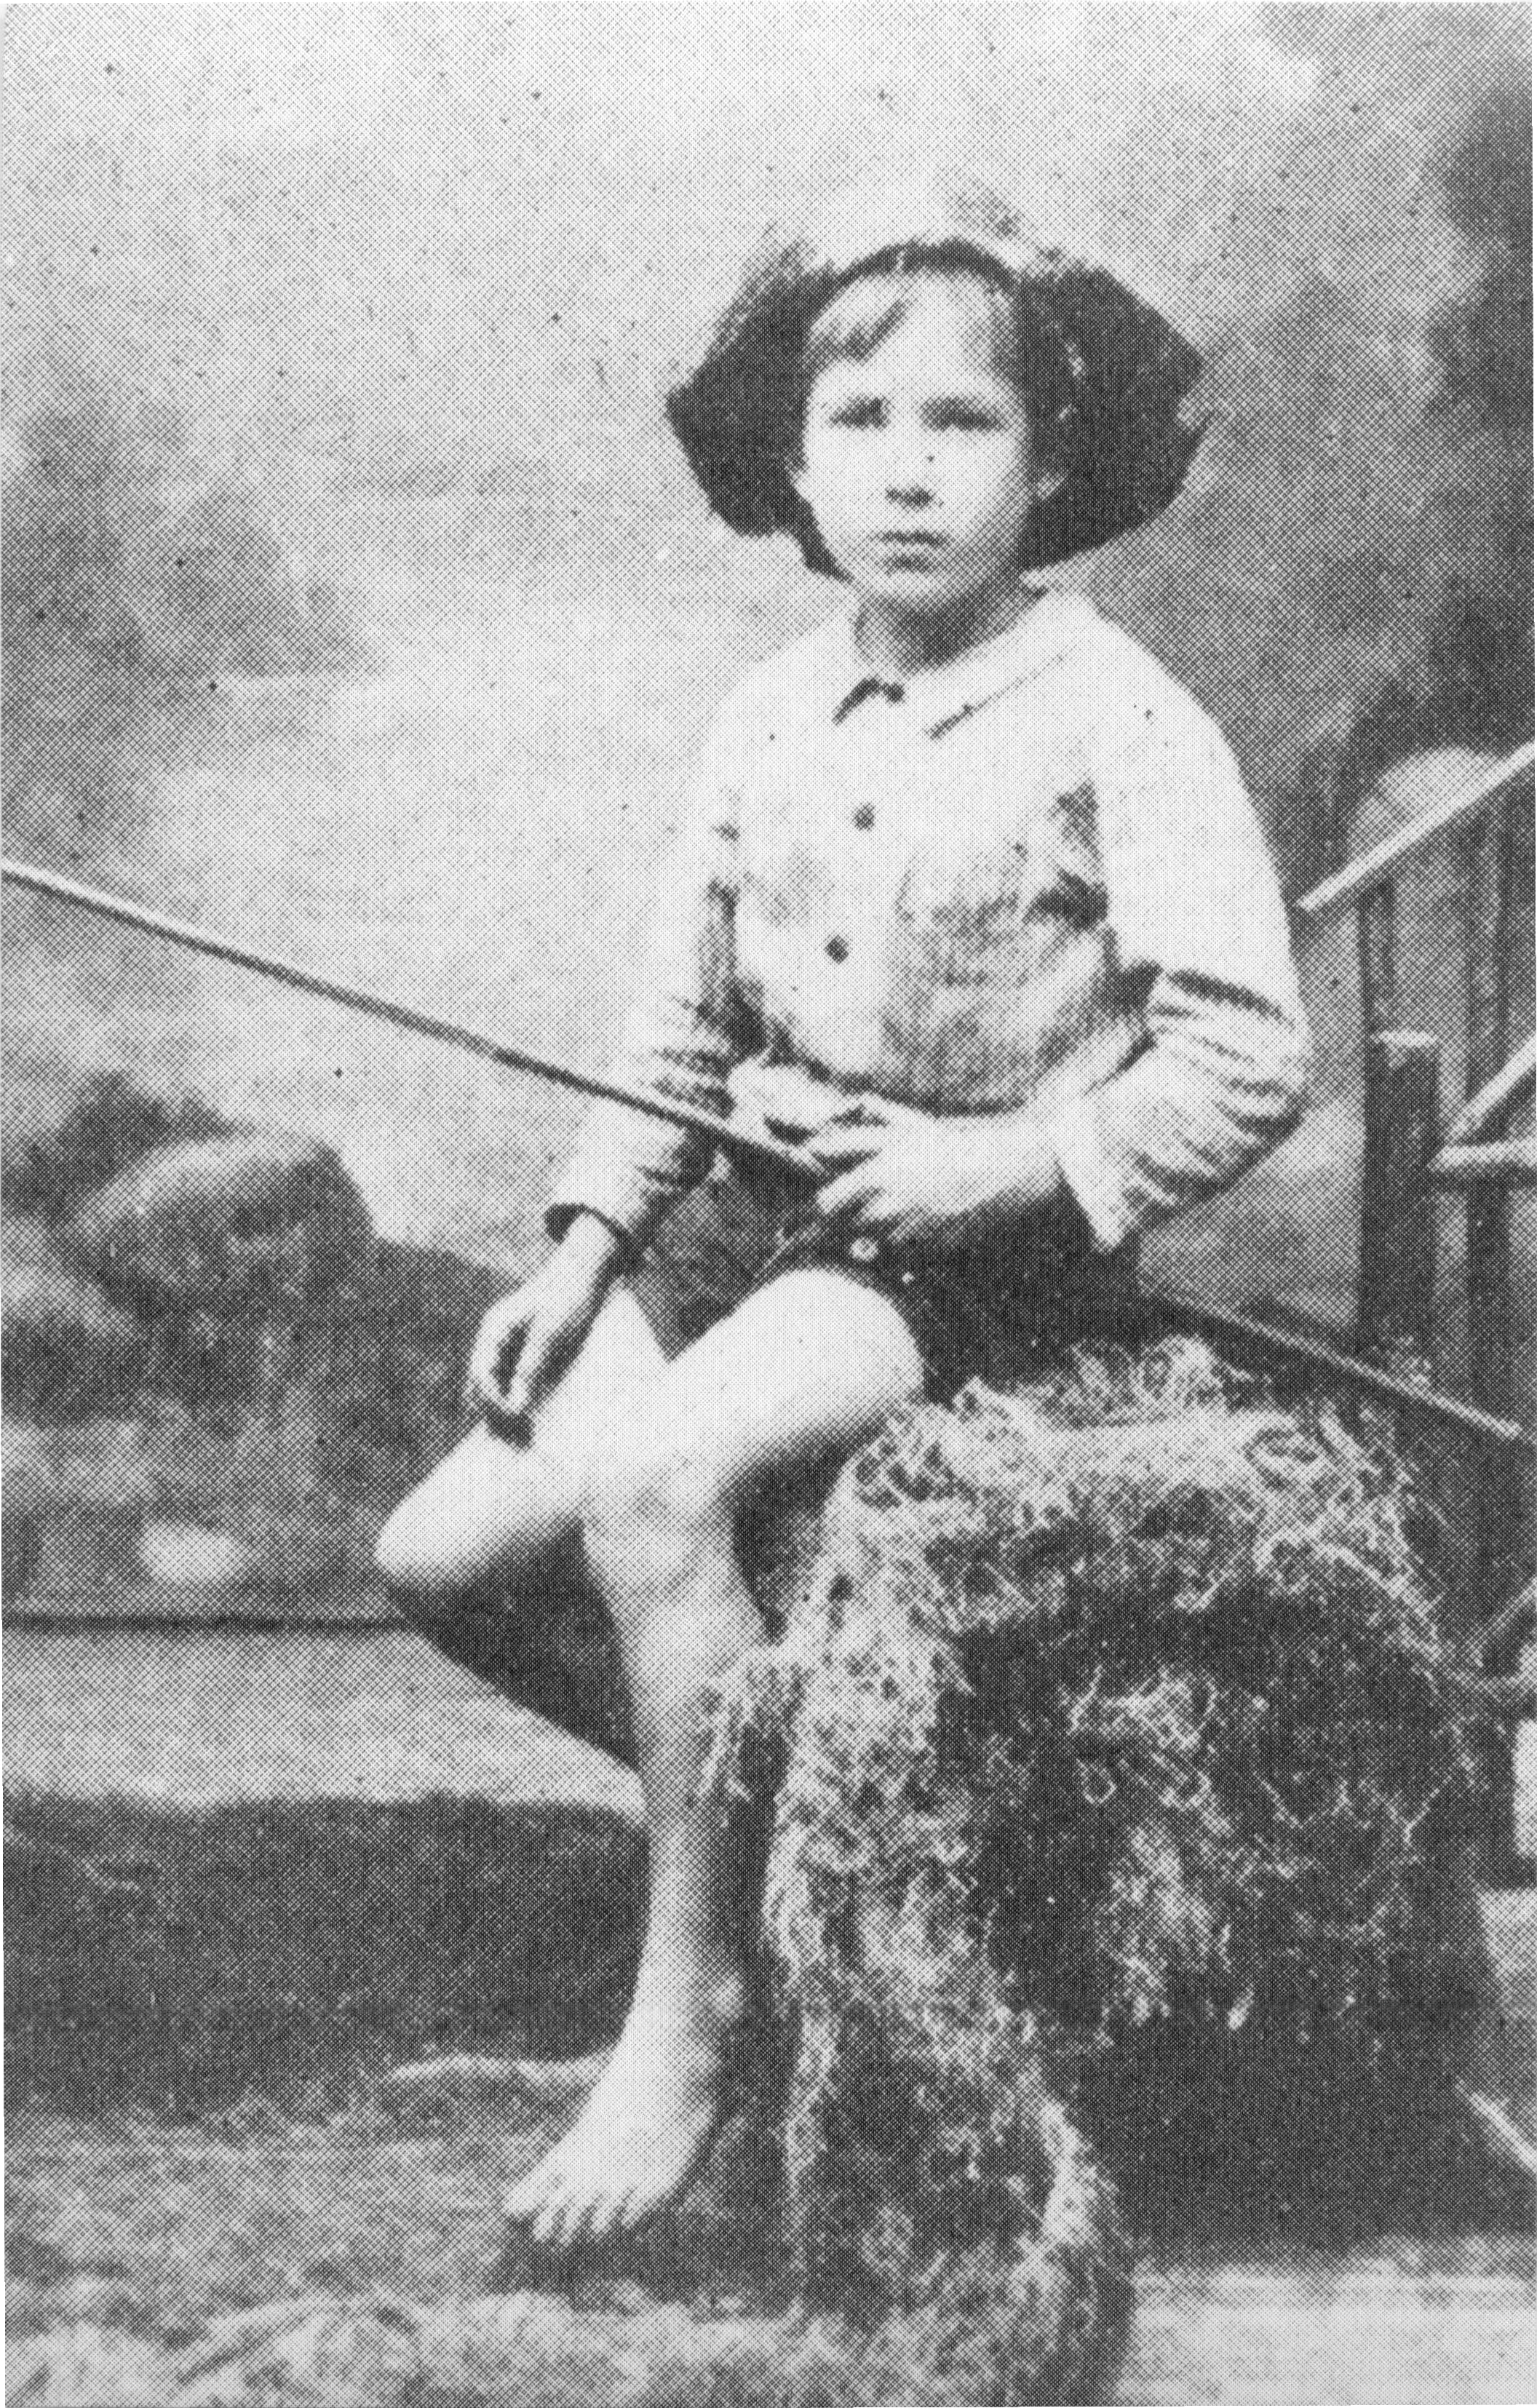 James Oliver Curwood at Age 7